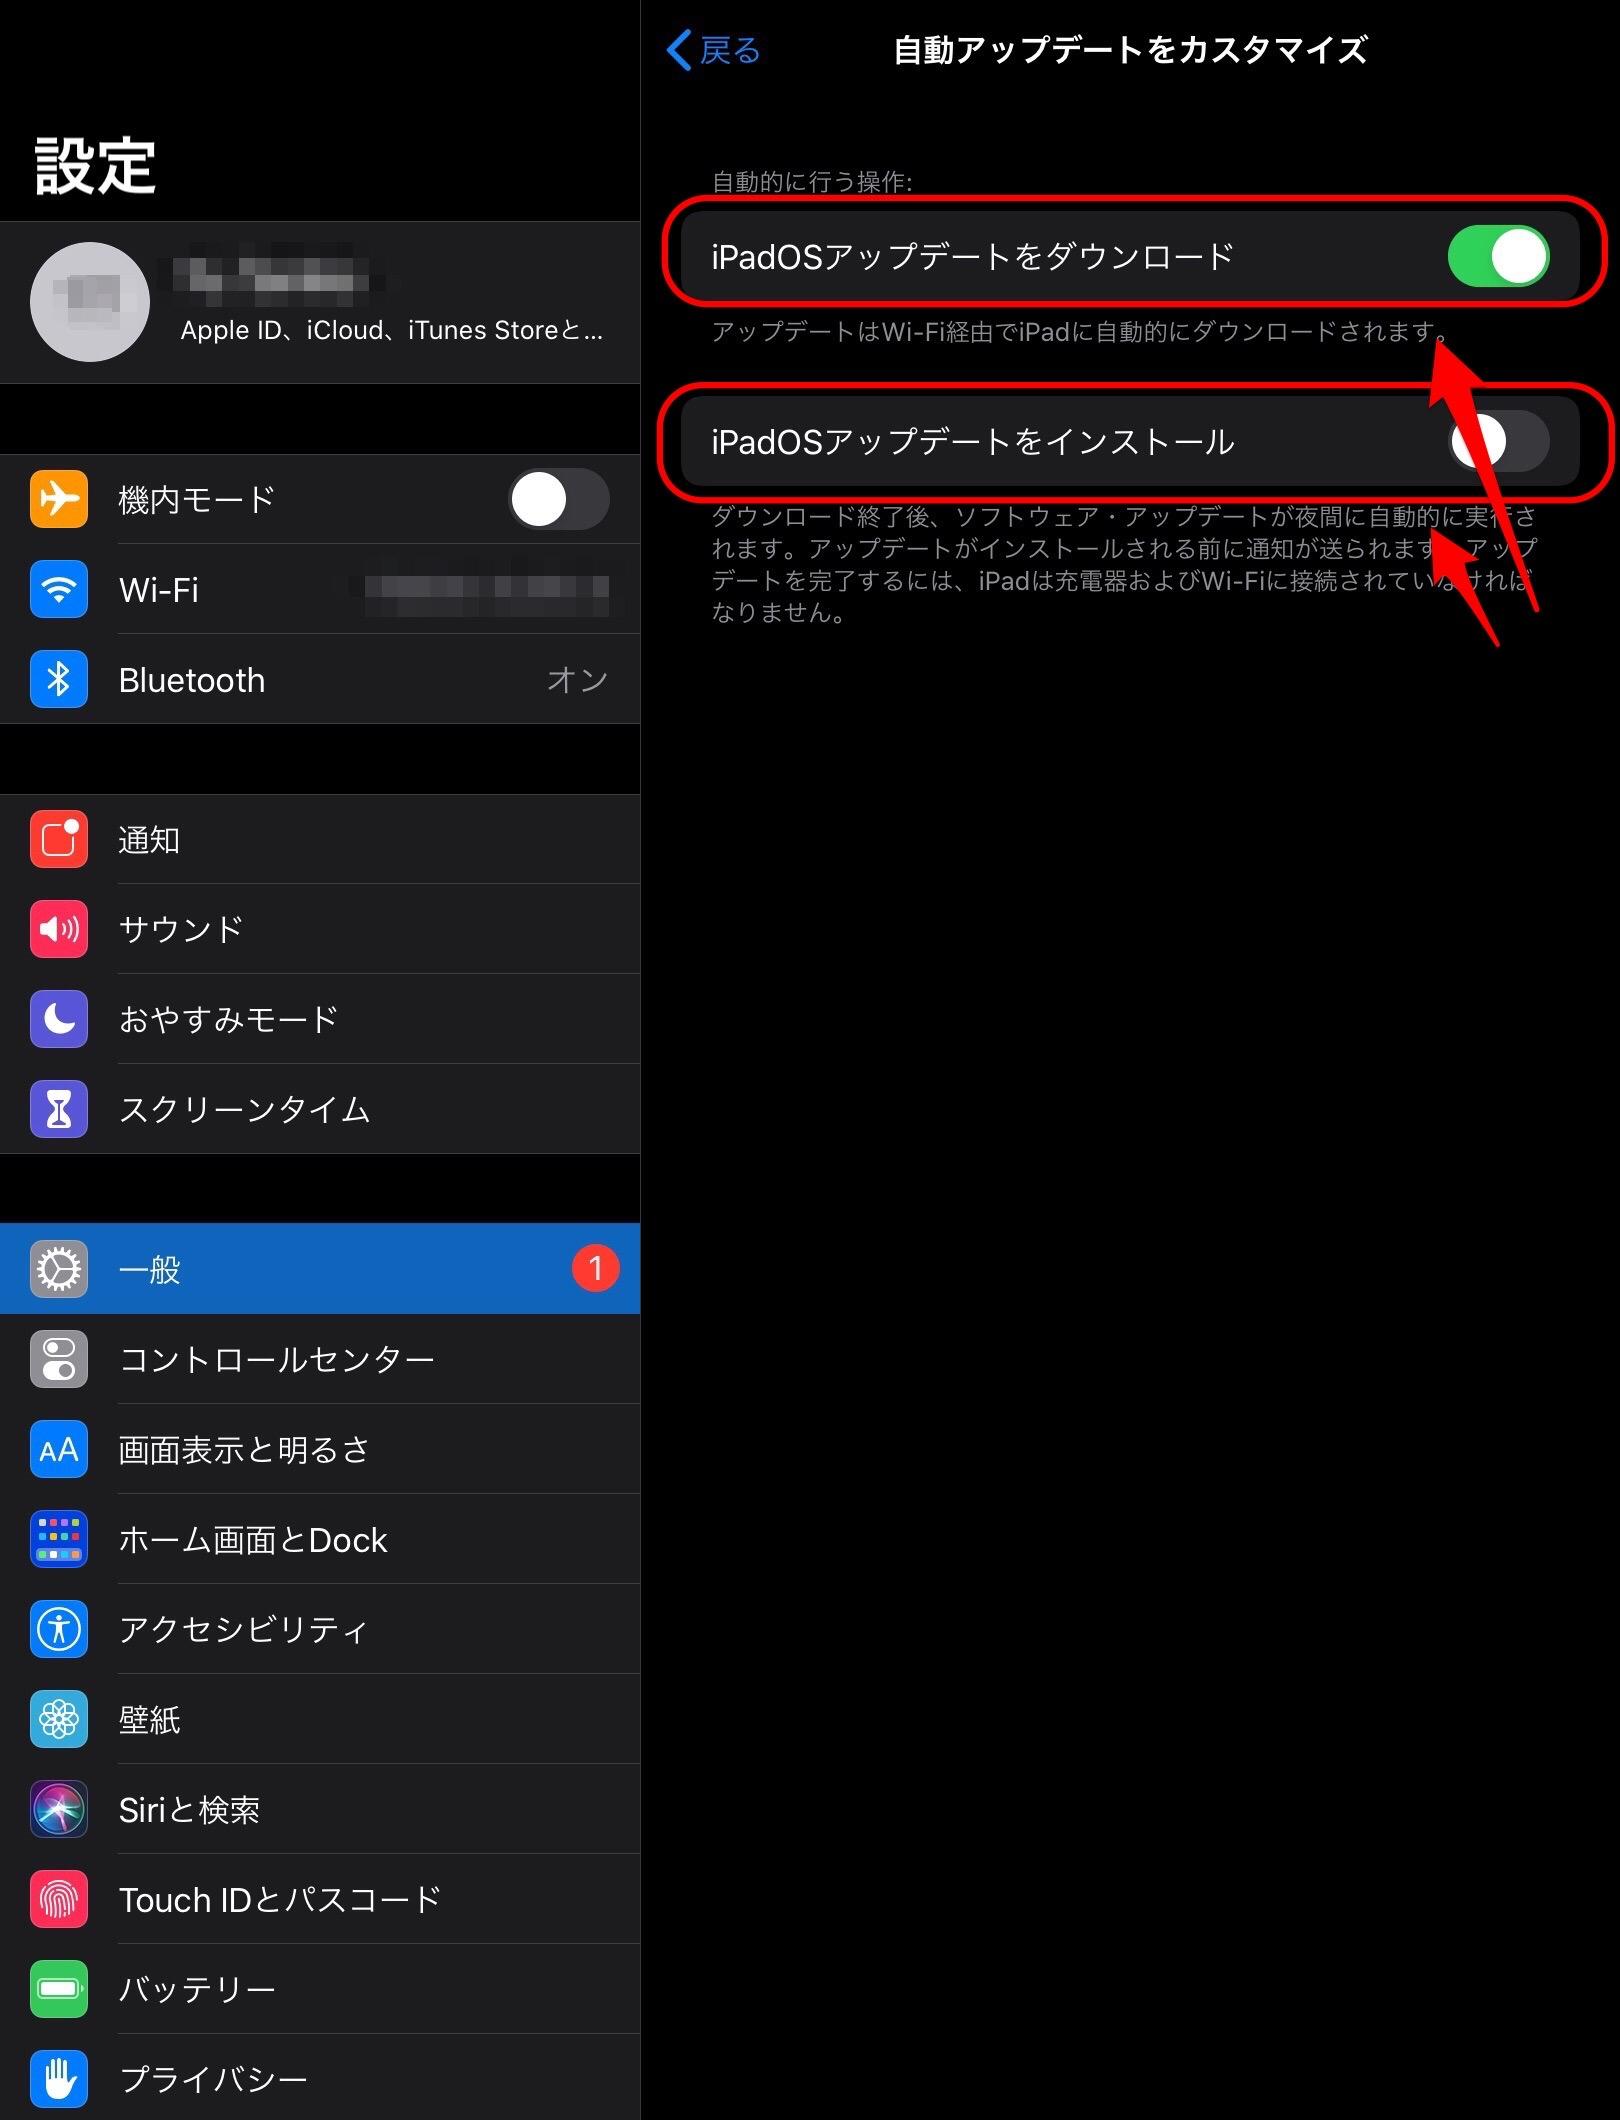 iOSアップデート オン